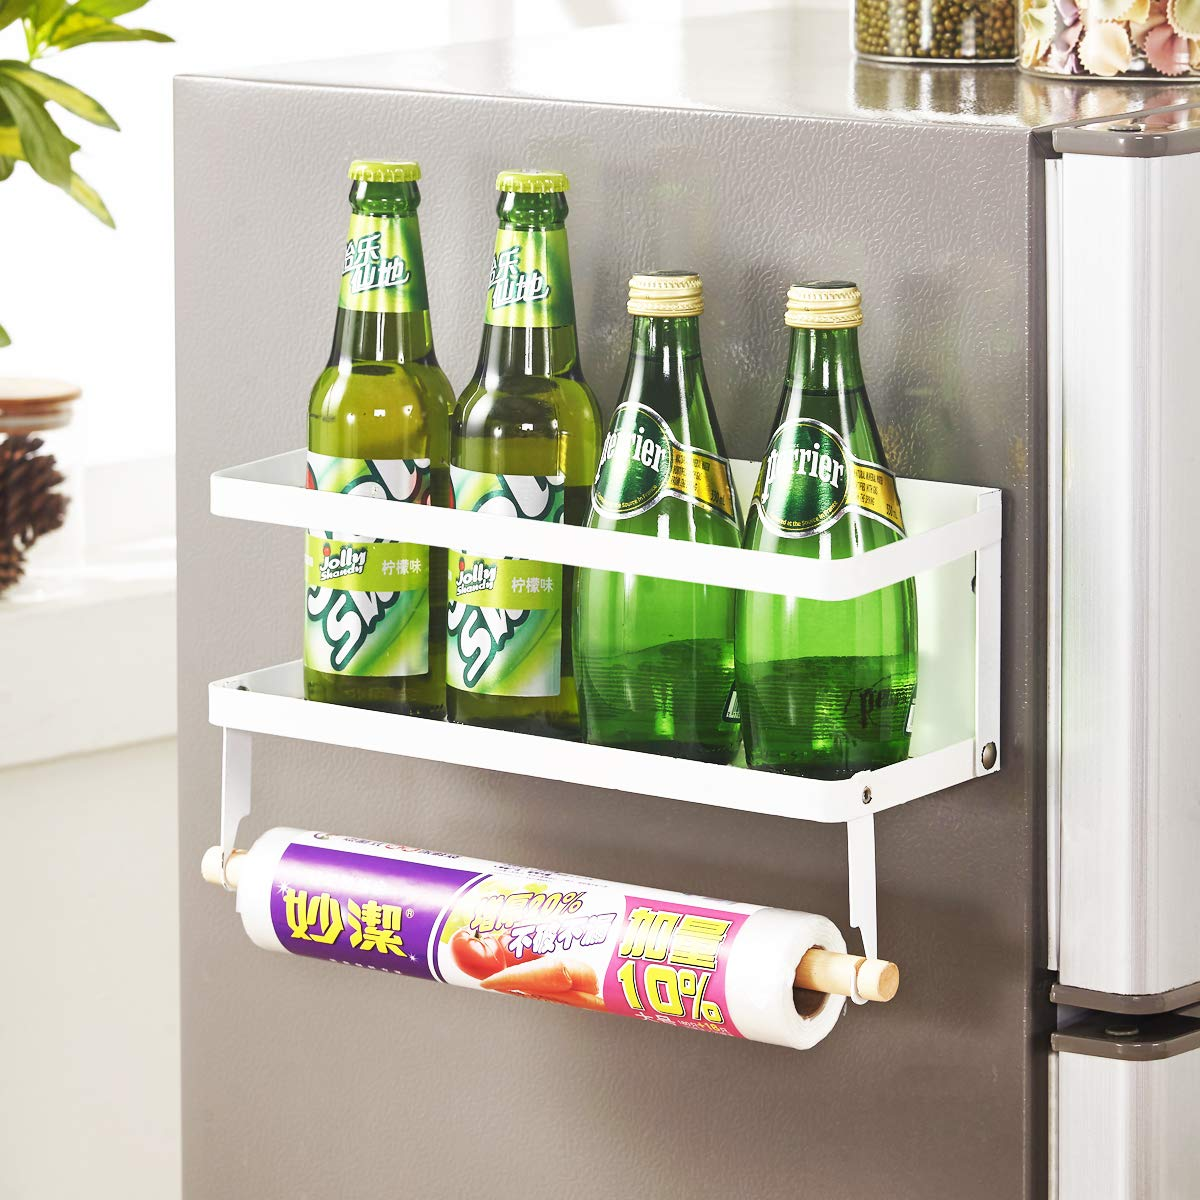 wengshilin Multiuse Magnetic Fridge Washing Machine Organizer Side Shelf with Paper Towel Holder, Foldable Design, White Color (1 Layer,Big Size)